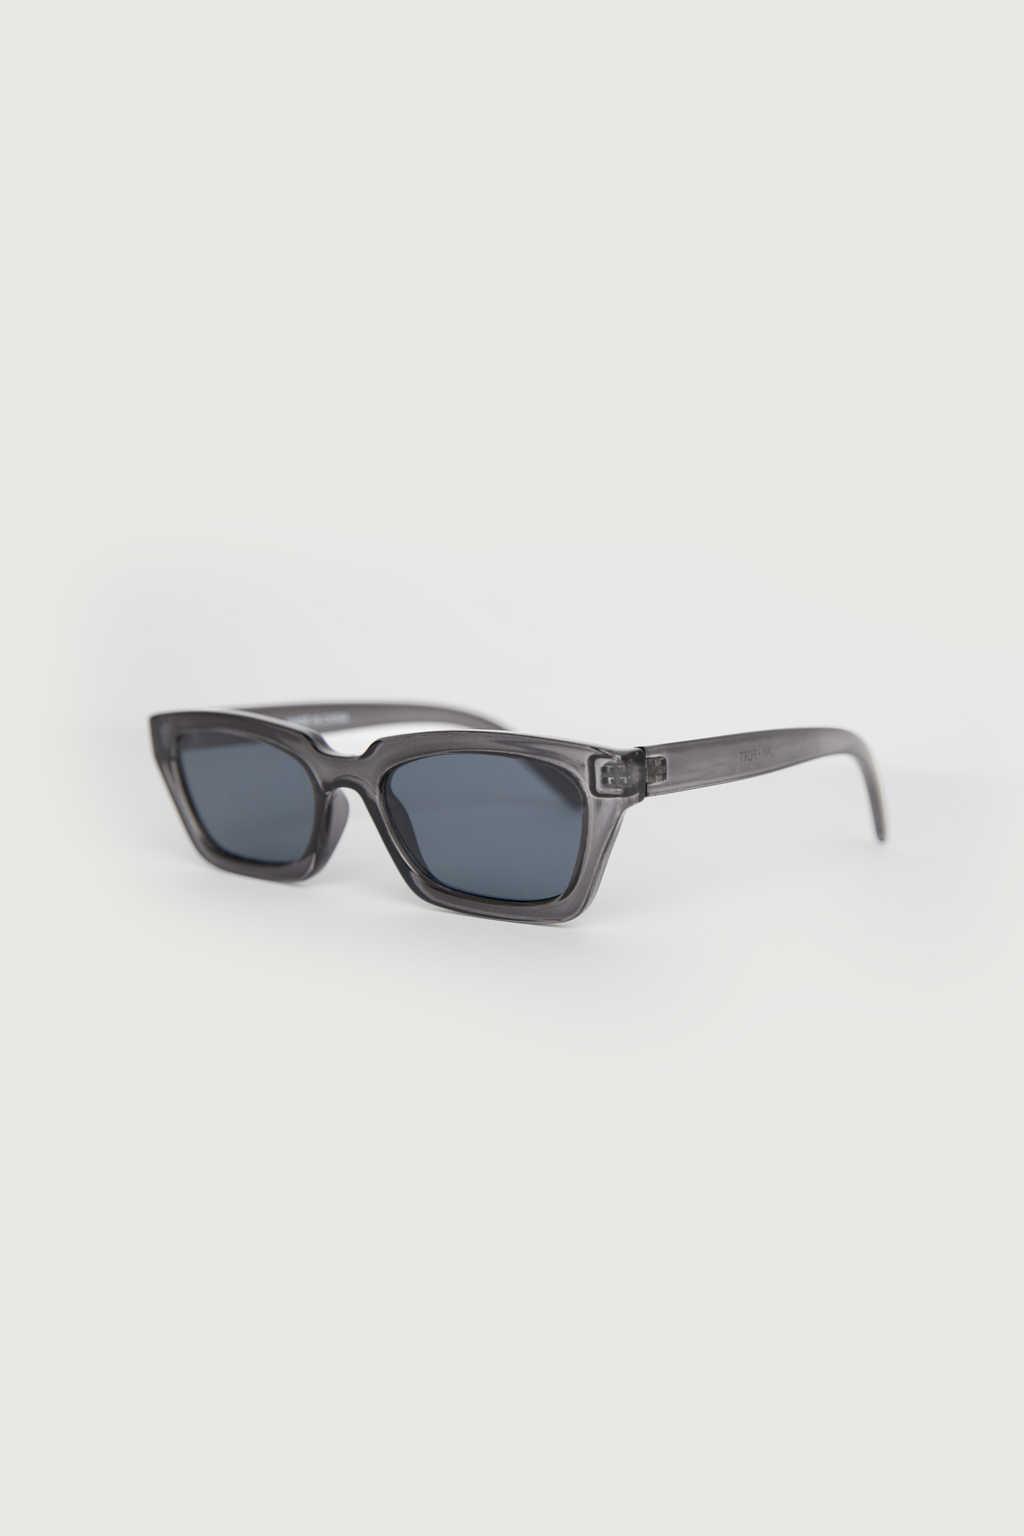 Sunglass 3366 Black 4